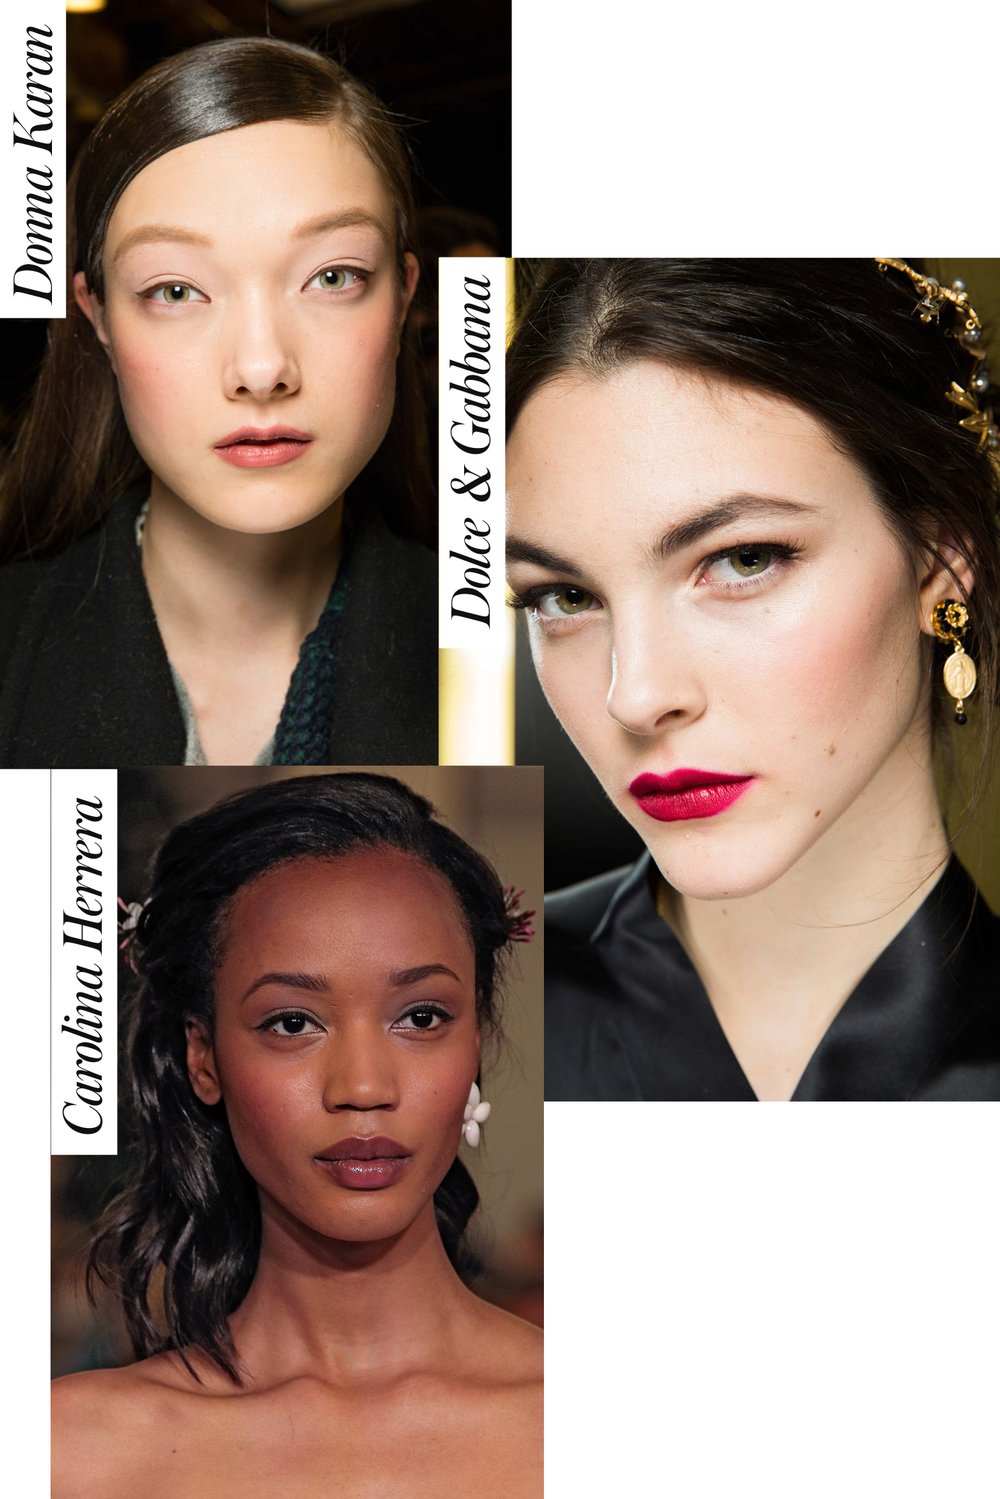 Bridal Makeup Dallas - Wedding Makeup Dallas - DFW BRIDAL Beauty